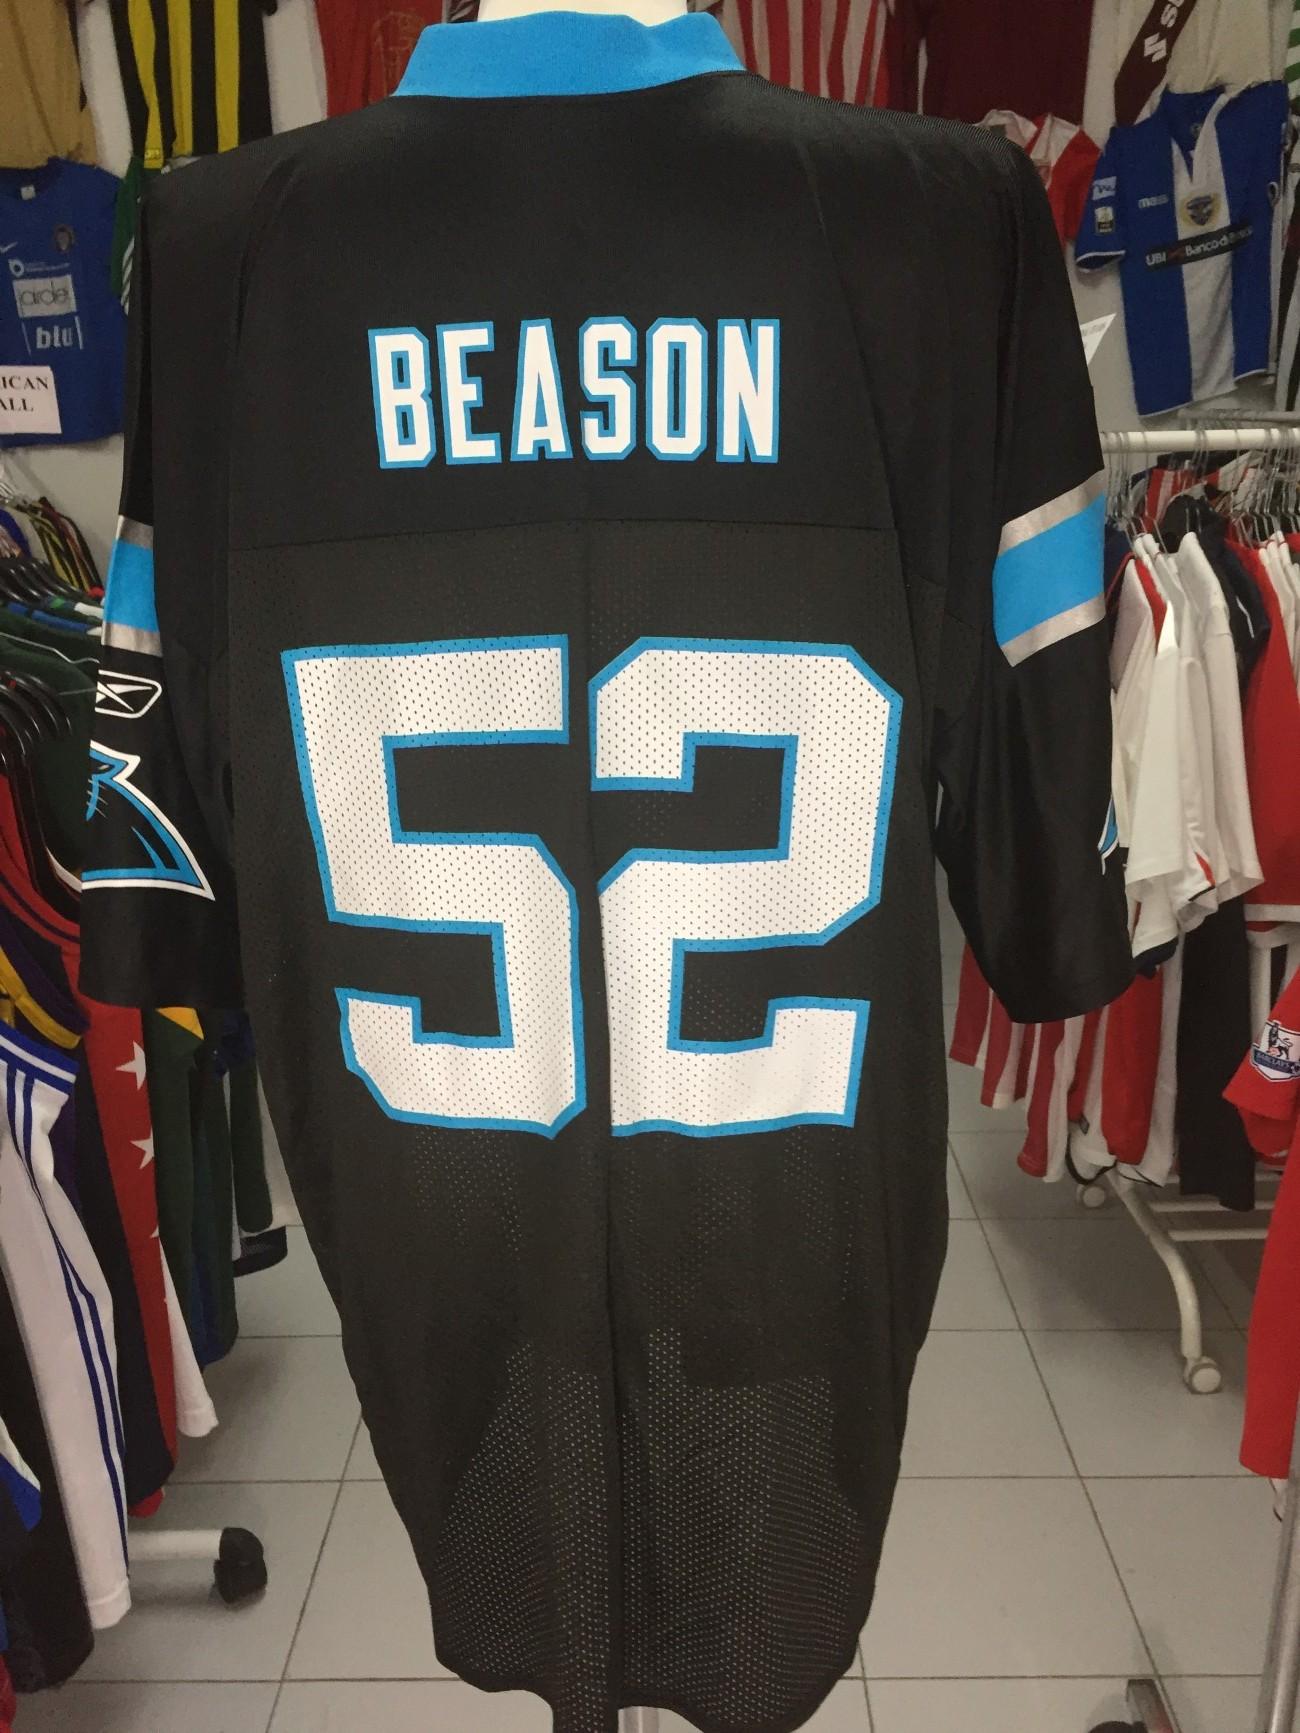 factory authentic a48ce 2fbb1 Carolina Panthers NFL Shirt (XL) #52 Beason Jersey Reebok Camisola |  Vintage Sports Classic Football Shirts Jerseys Camisolas Futebol NBA